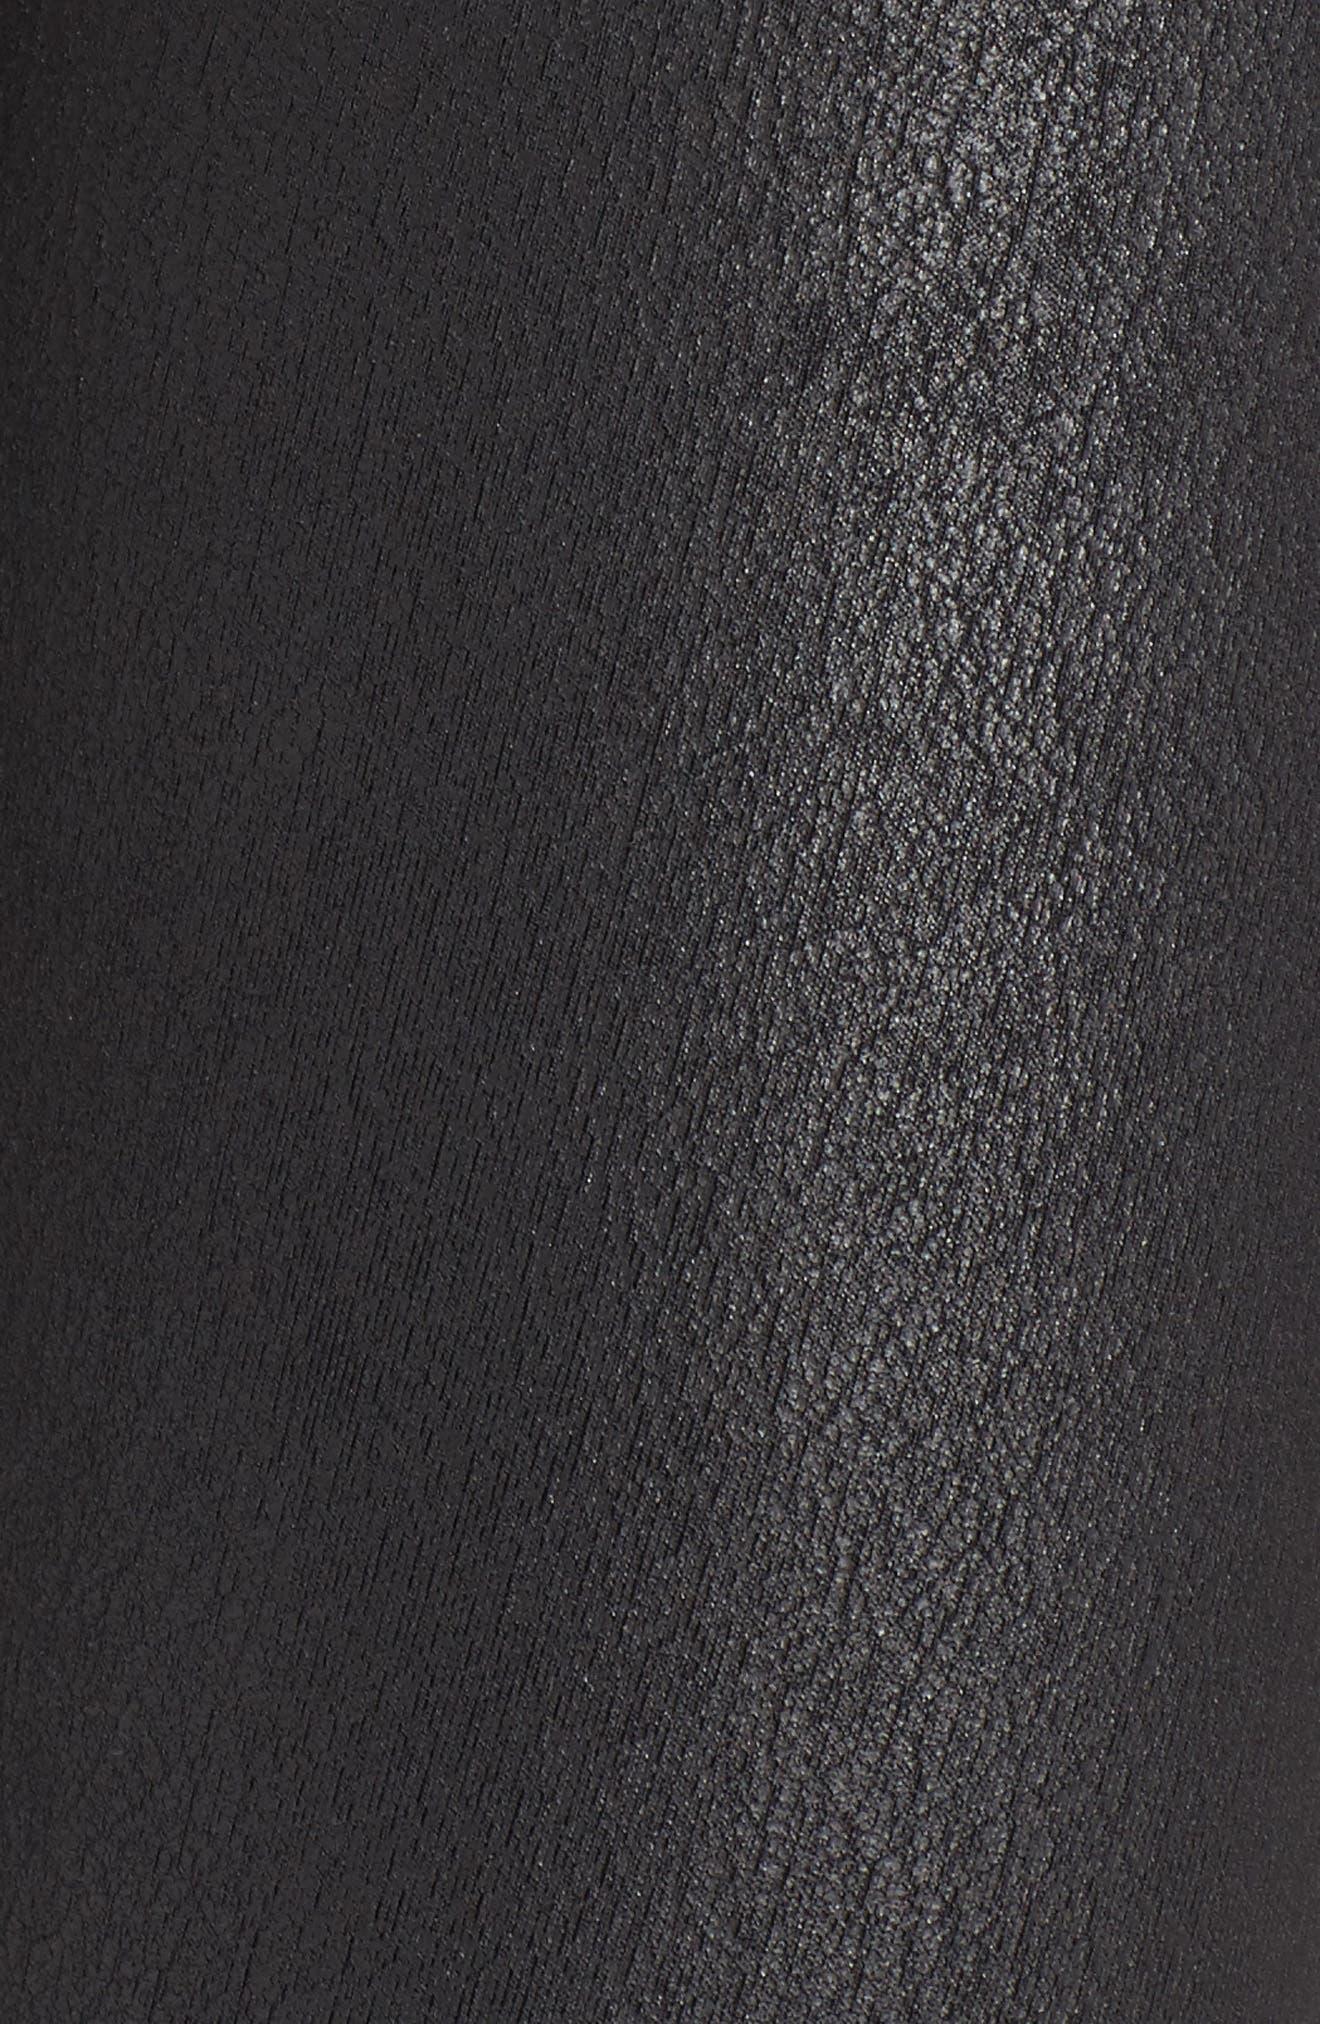 'Airbrushed' Leggings,                             Alternate thumbnail 176, color,